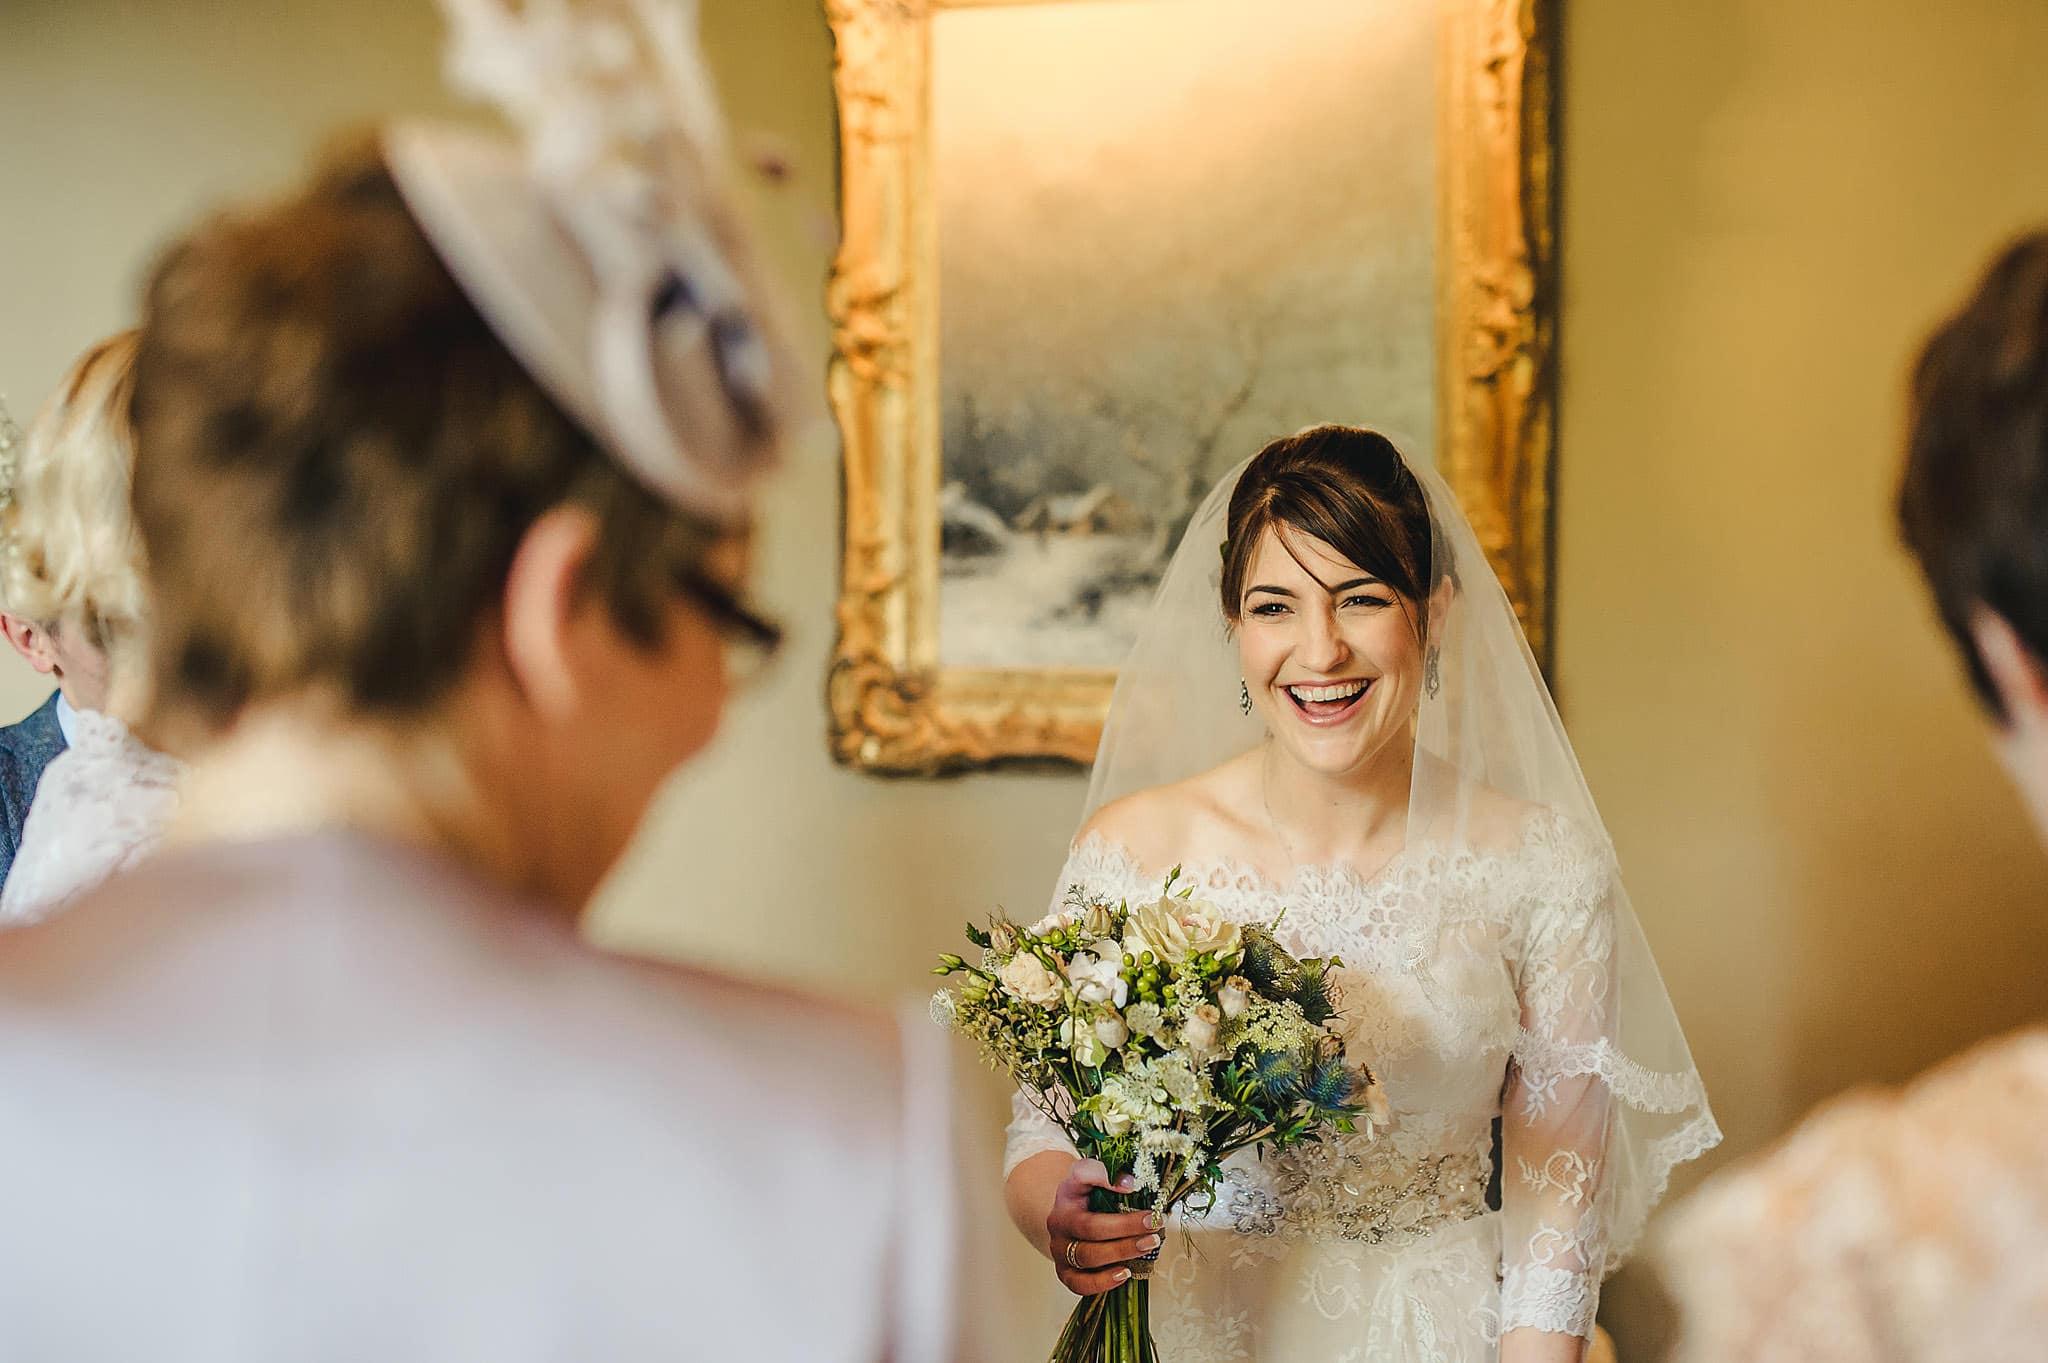 Dewsall Court wedding photography Herefordshire | Laura + Alex 39